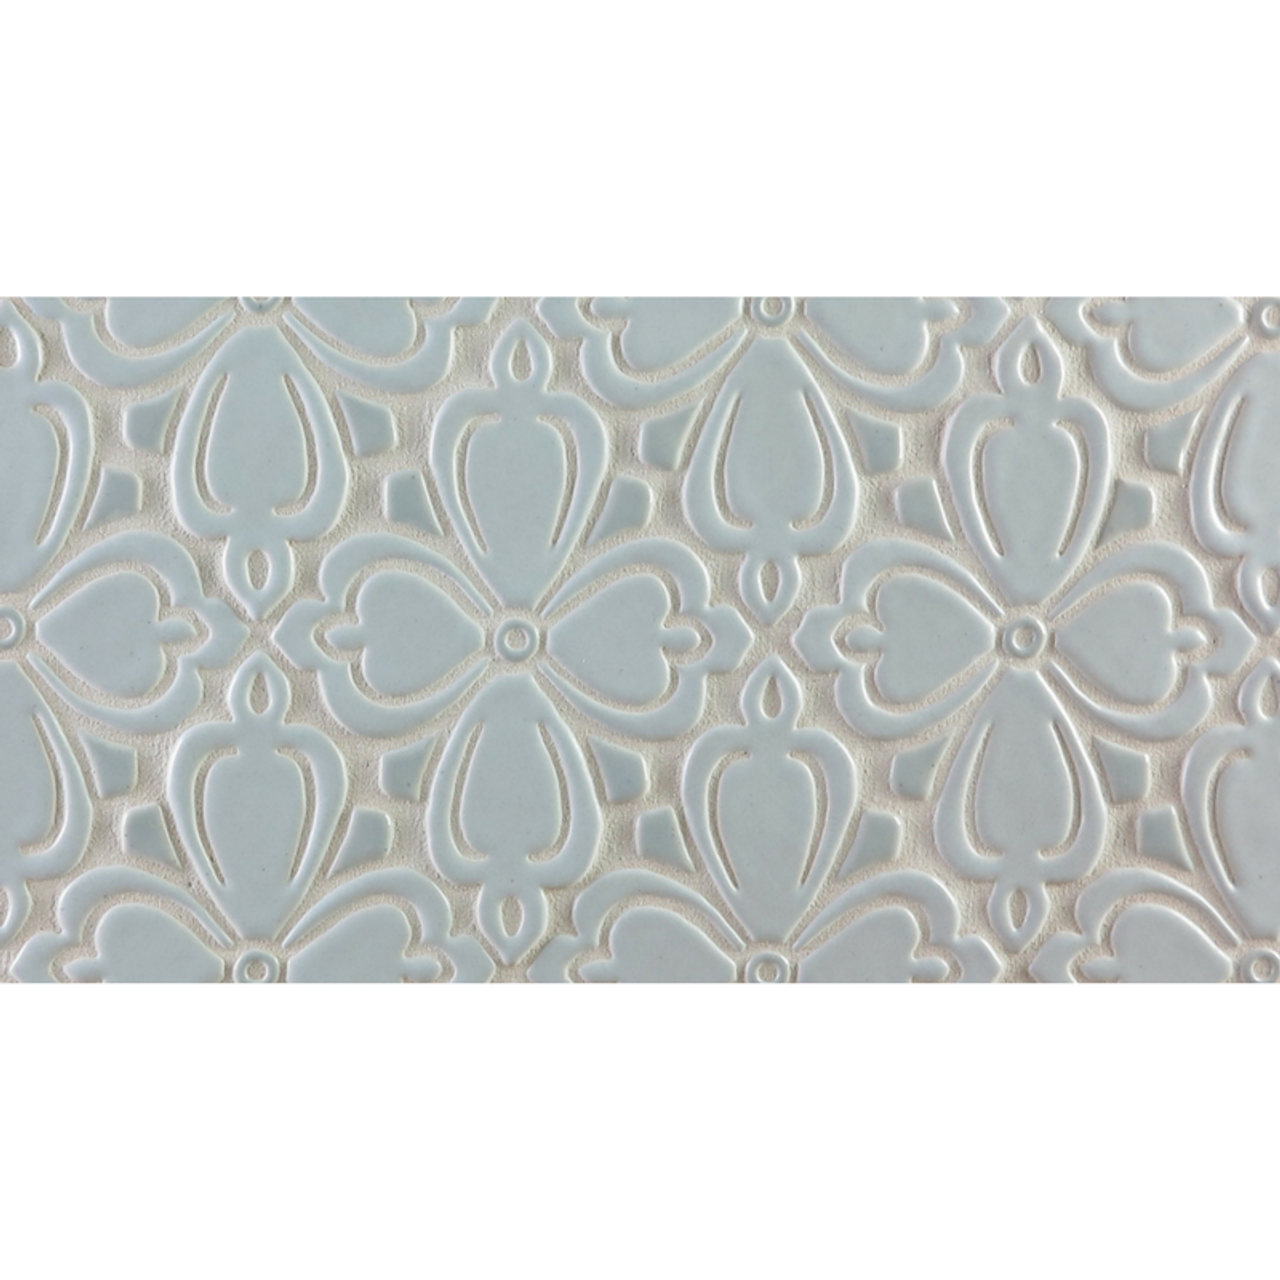 Two-Color Brocade Handmade Tile Border - Julep Tile Company